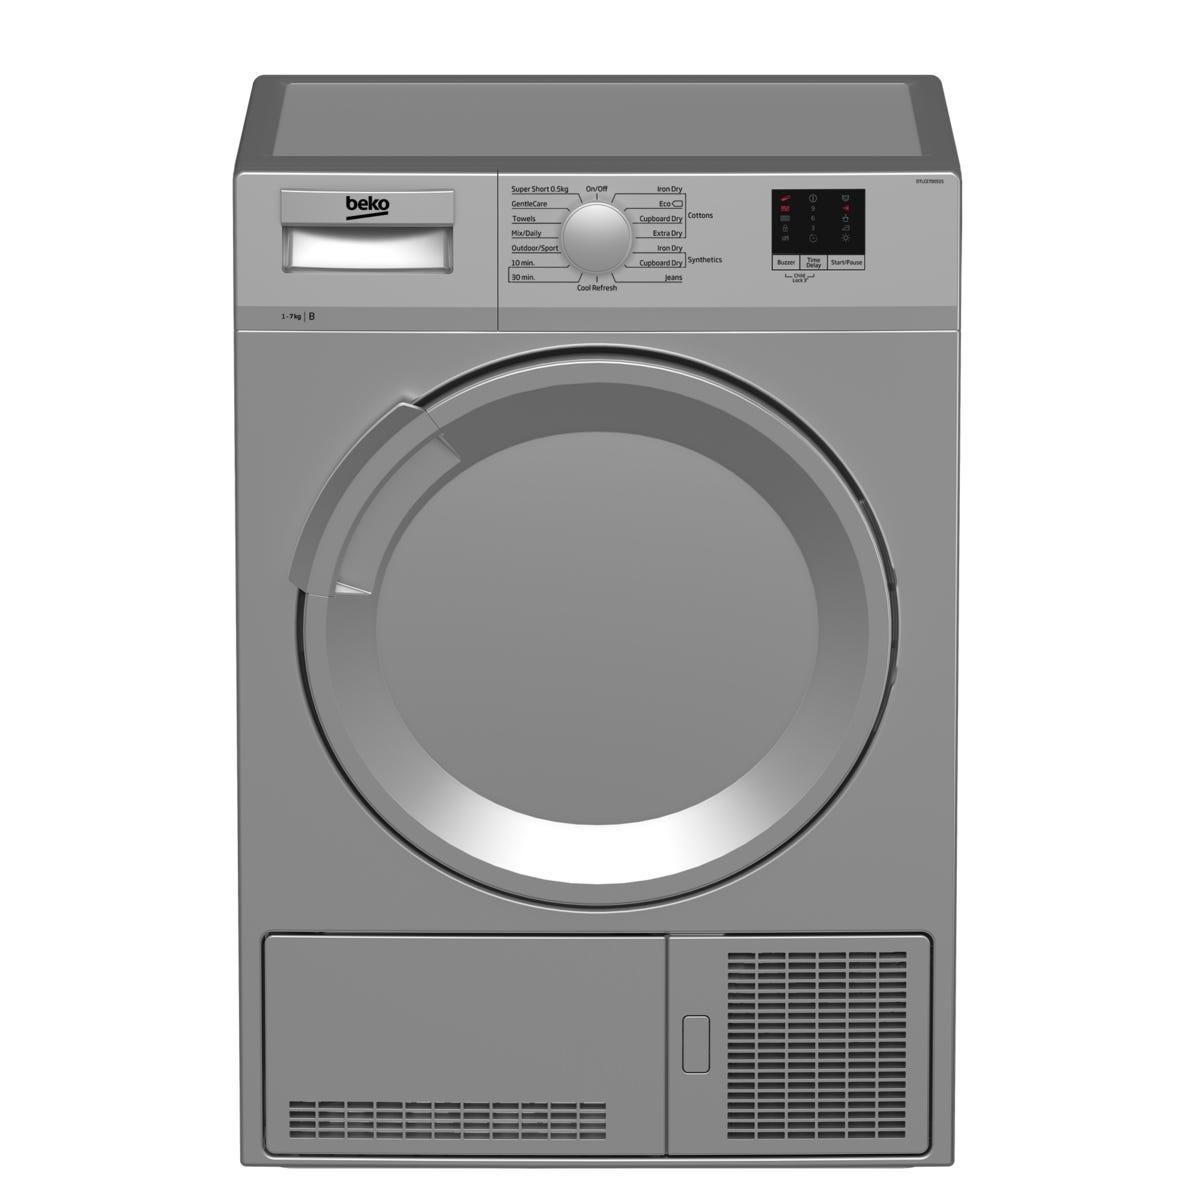 Beko DTLCE70051S 7kg Freestanding Condenser Tumble Dryer - Silver